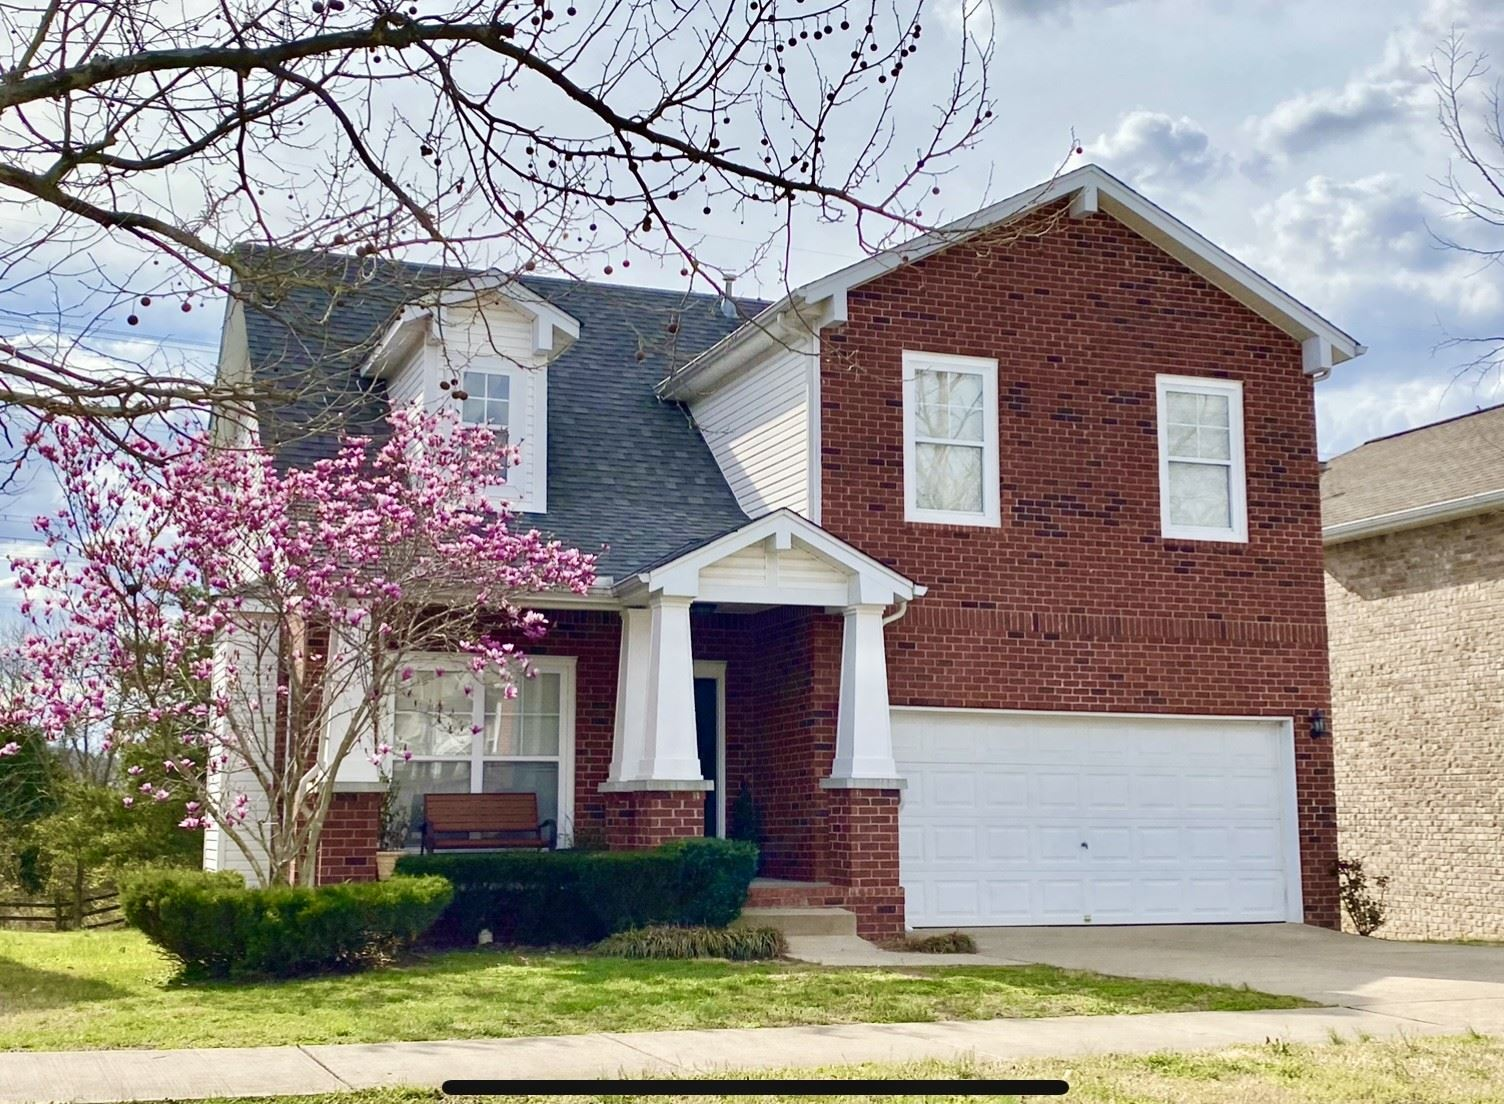 6872 Bridgewater Dr, Nashville, TN 37221 - MLS#: 2258635